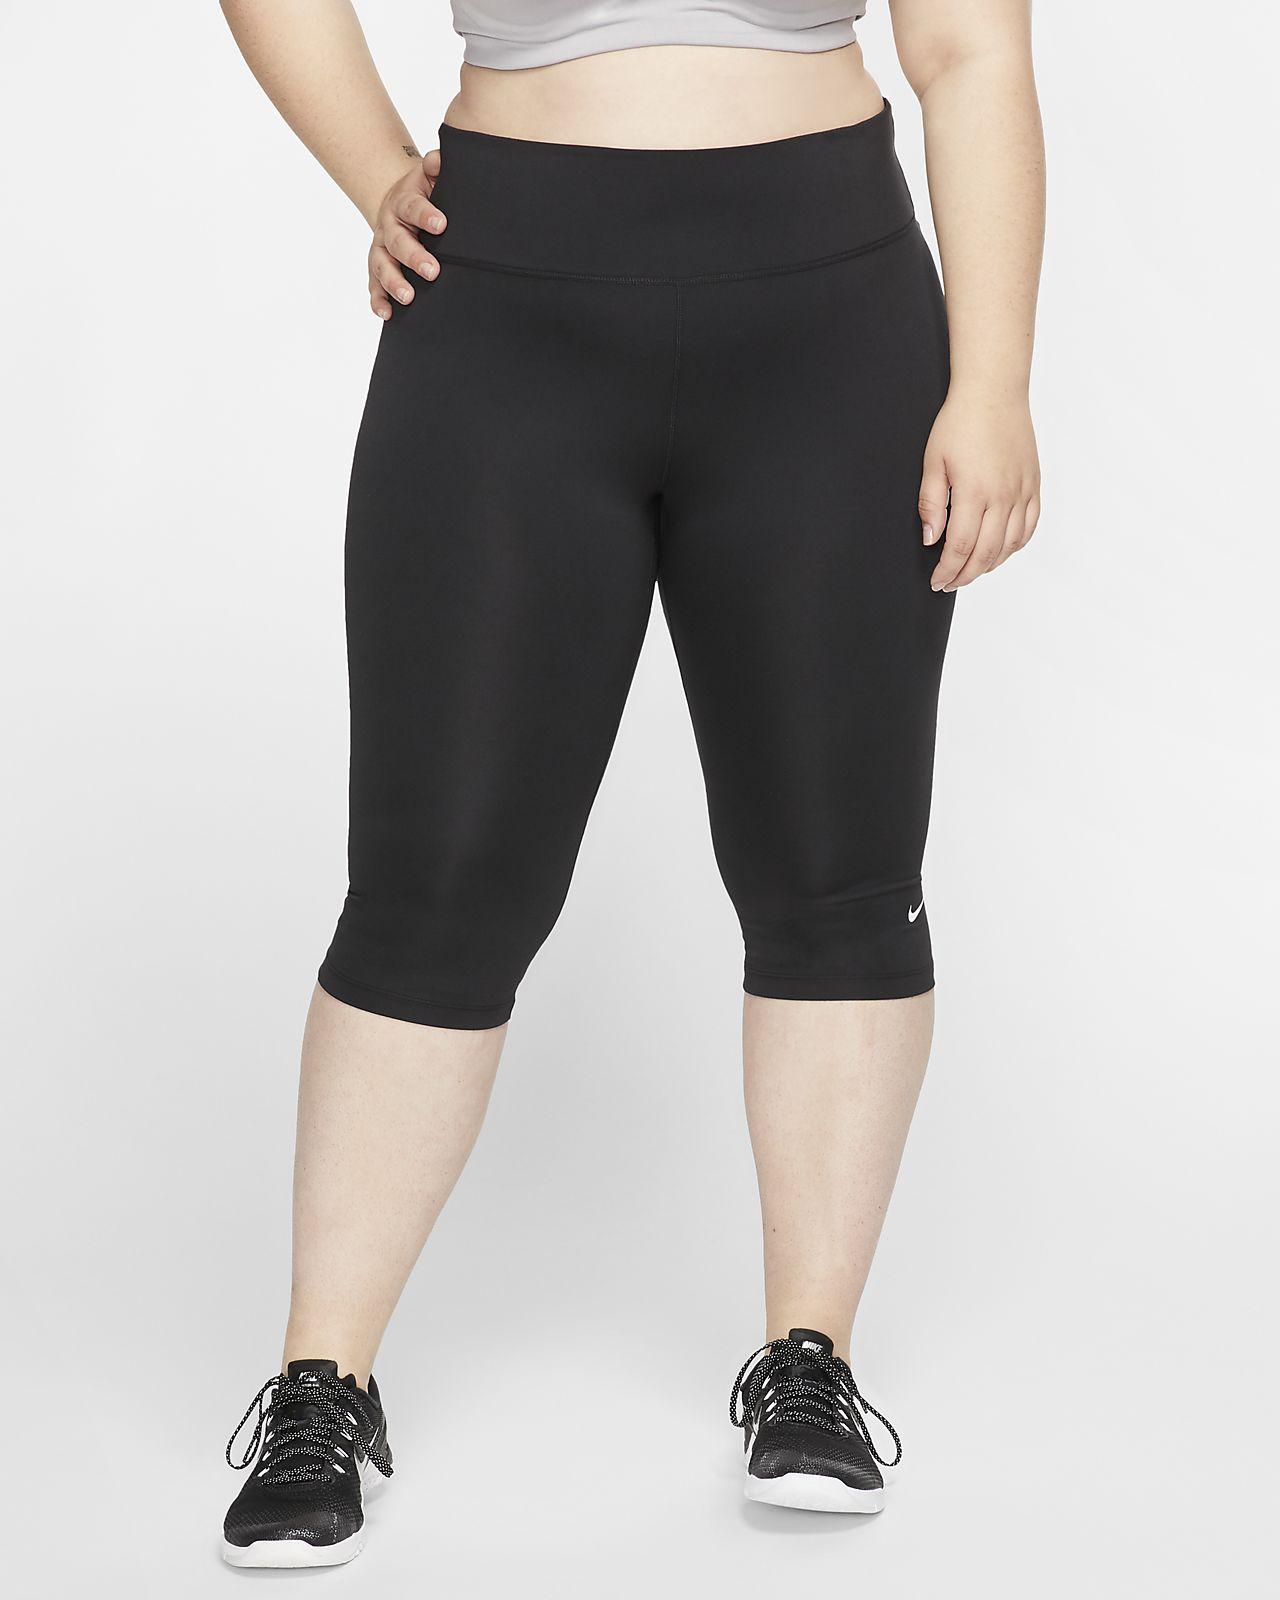 Nike One capribukser til dame (Plus Size)